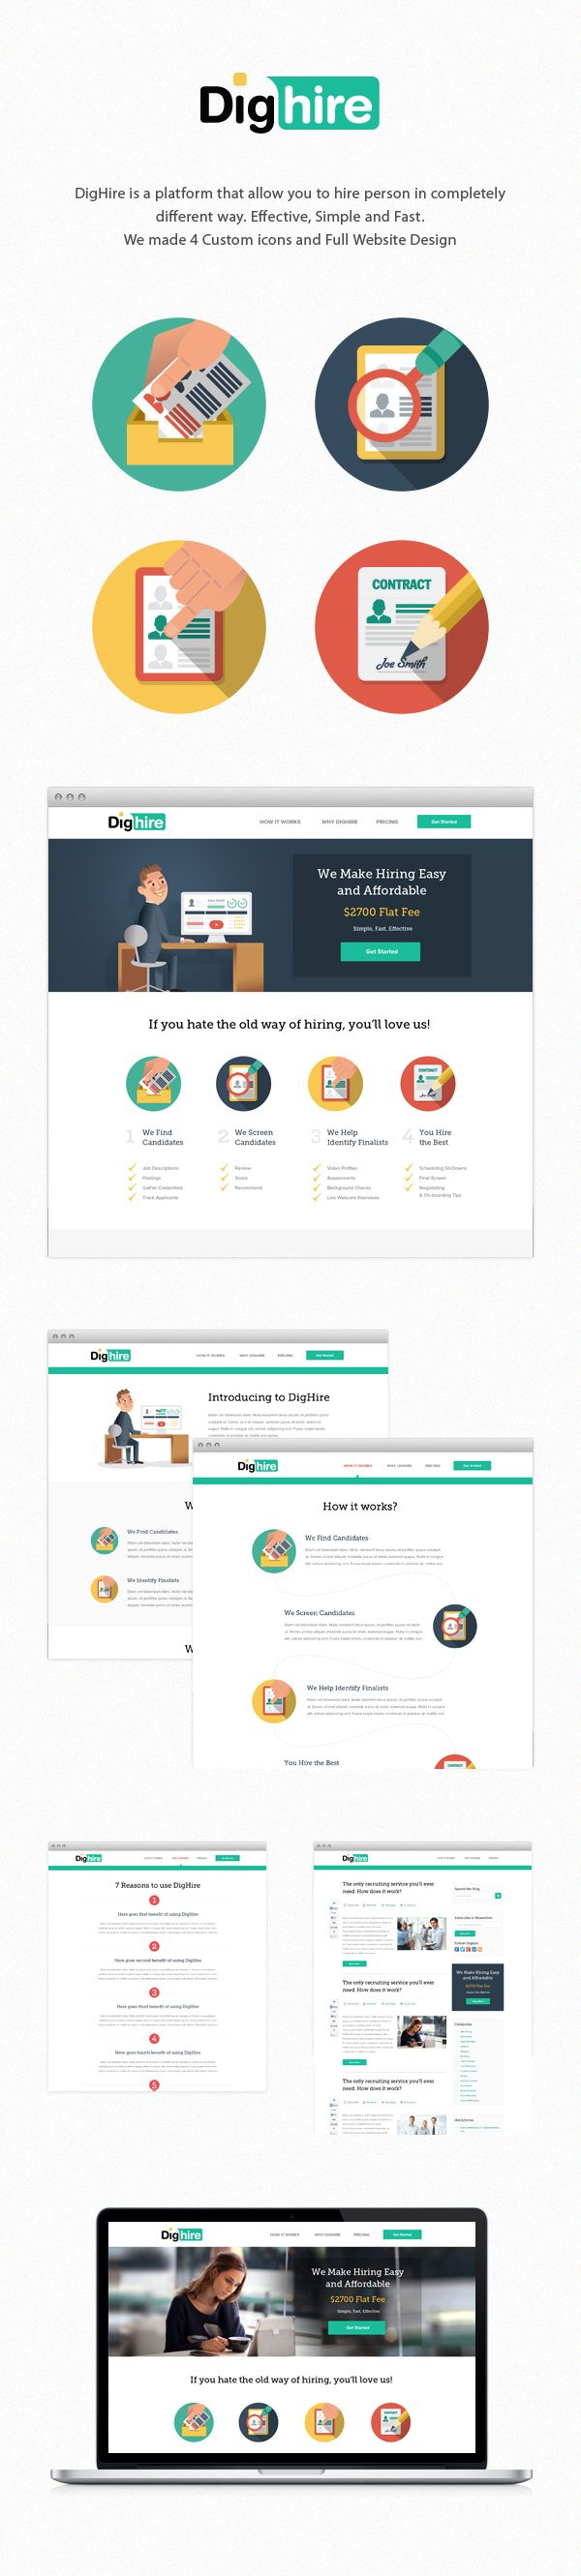 DigHire Website Design by Tomek Nowak, via Behance